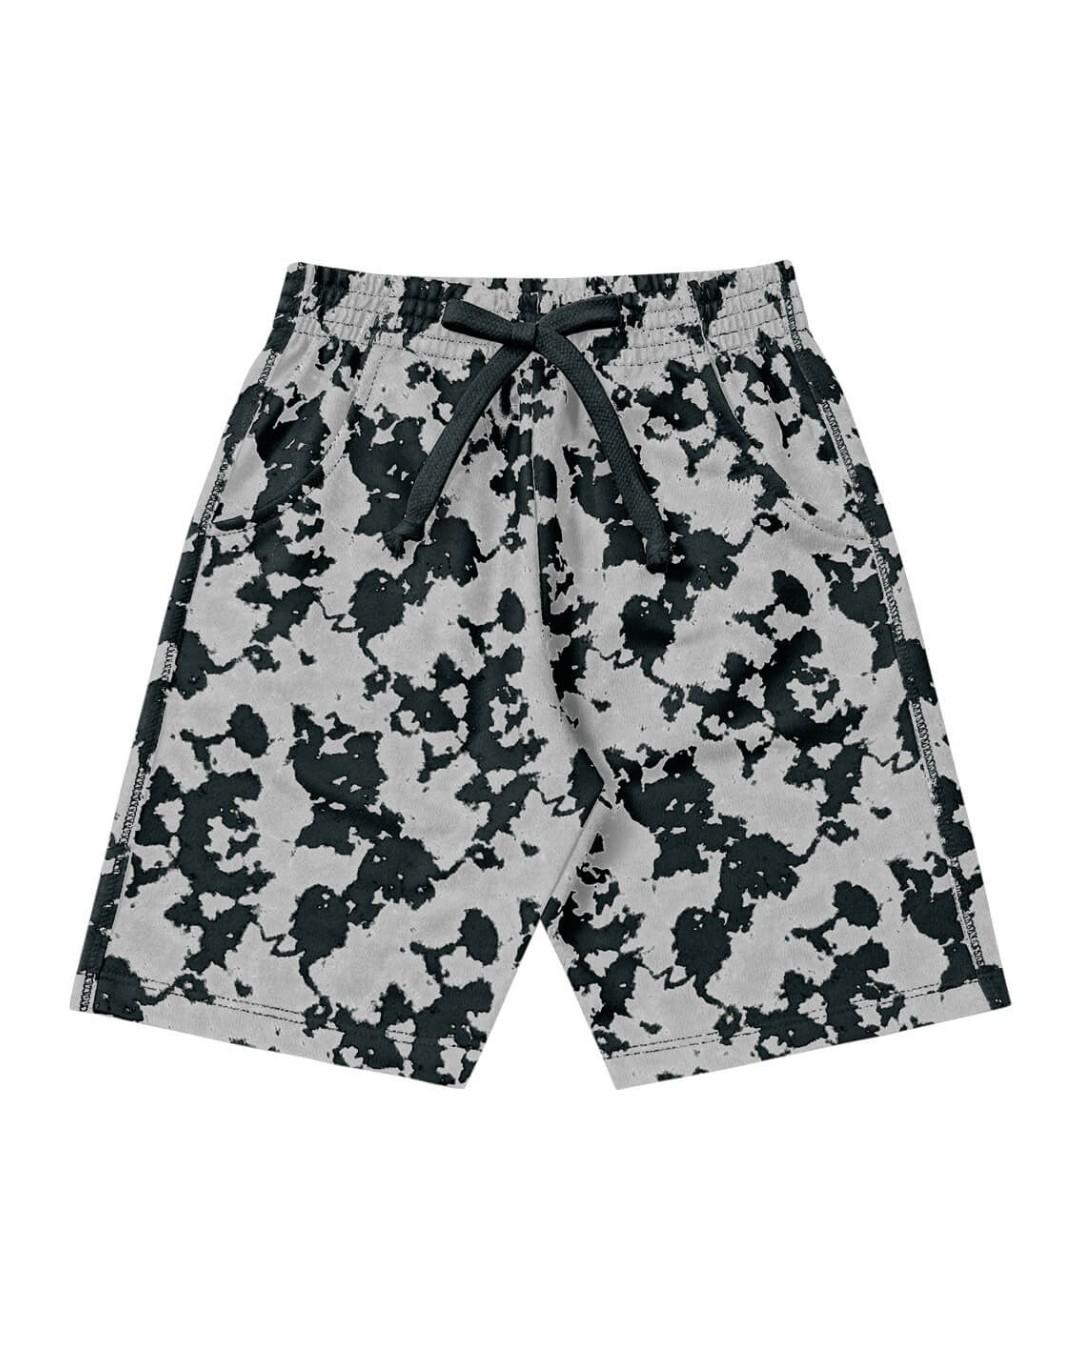 Bermuda Infanto-Juvenil Militar Jeans - Playground